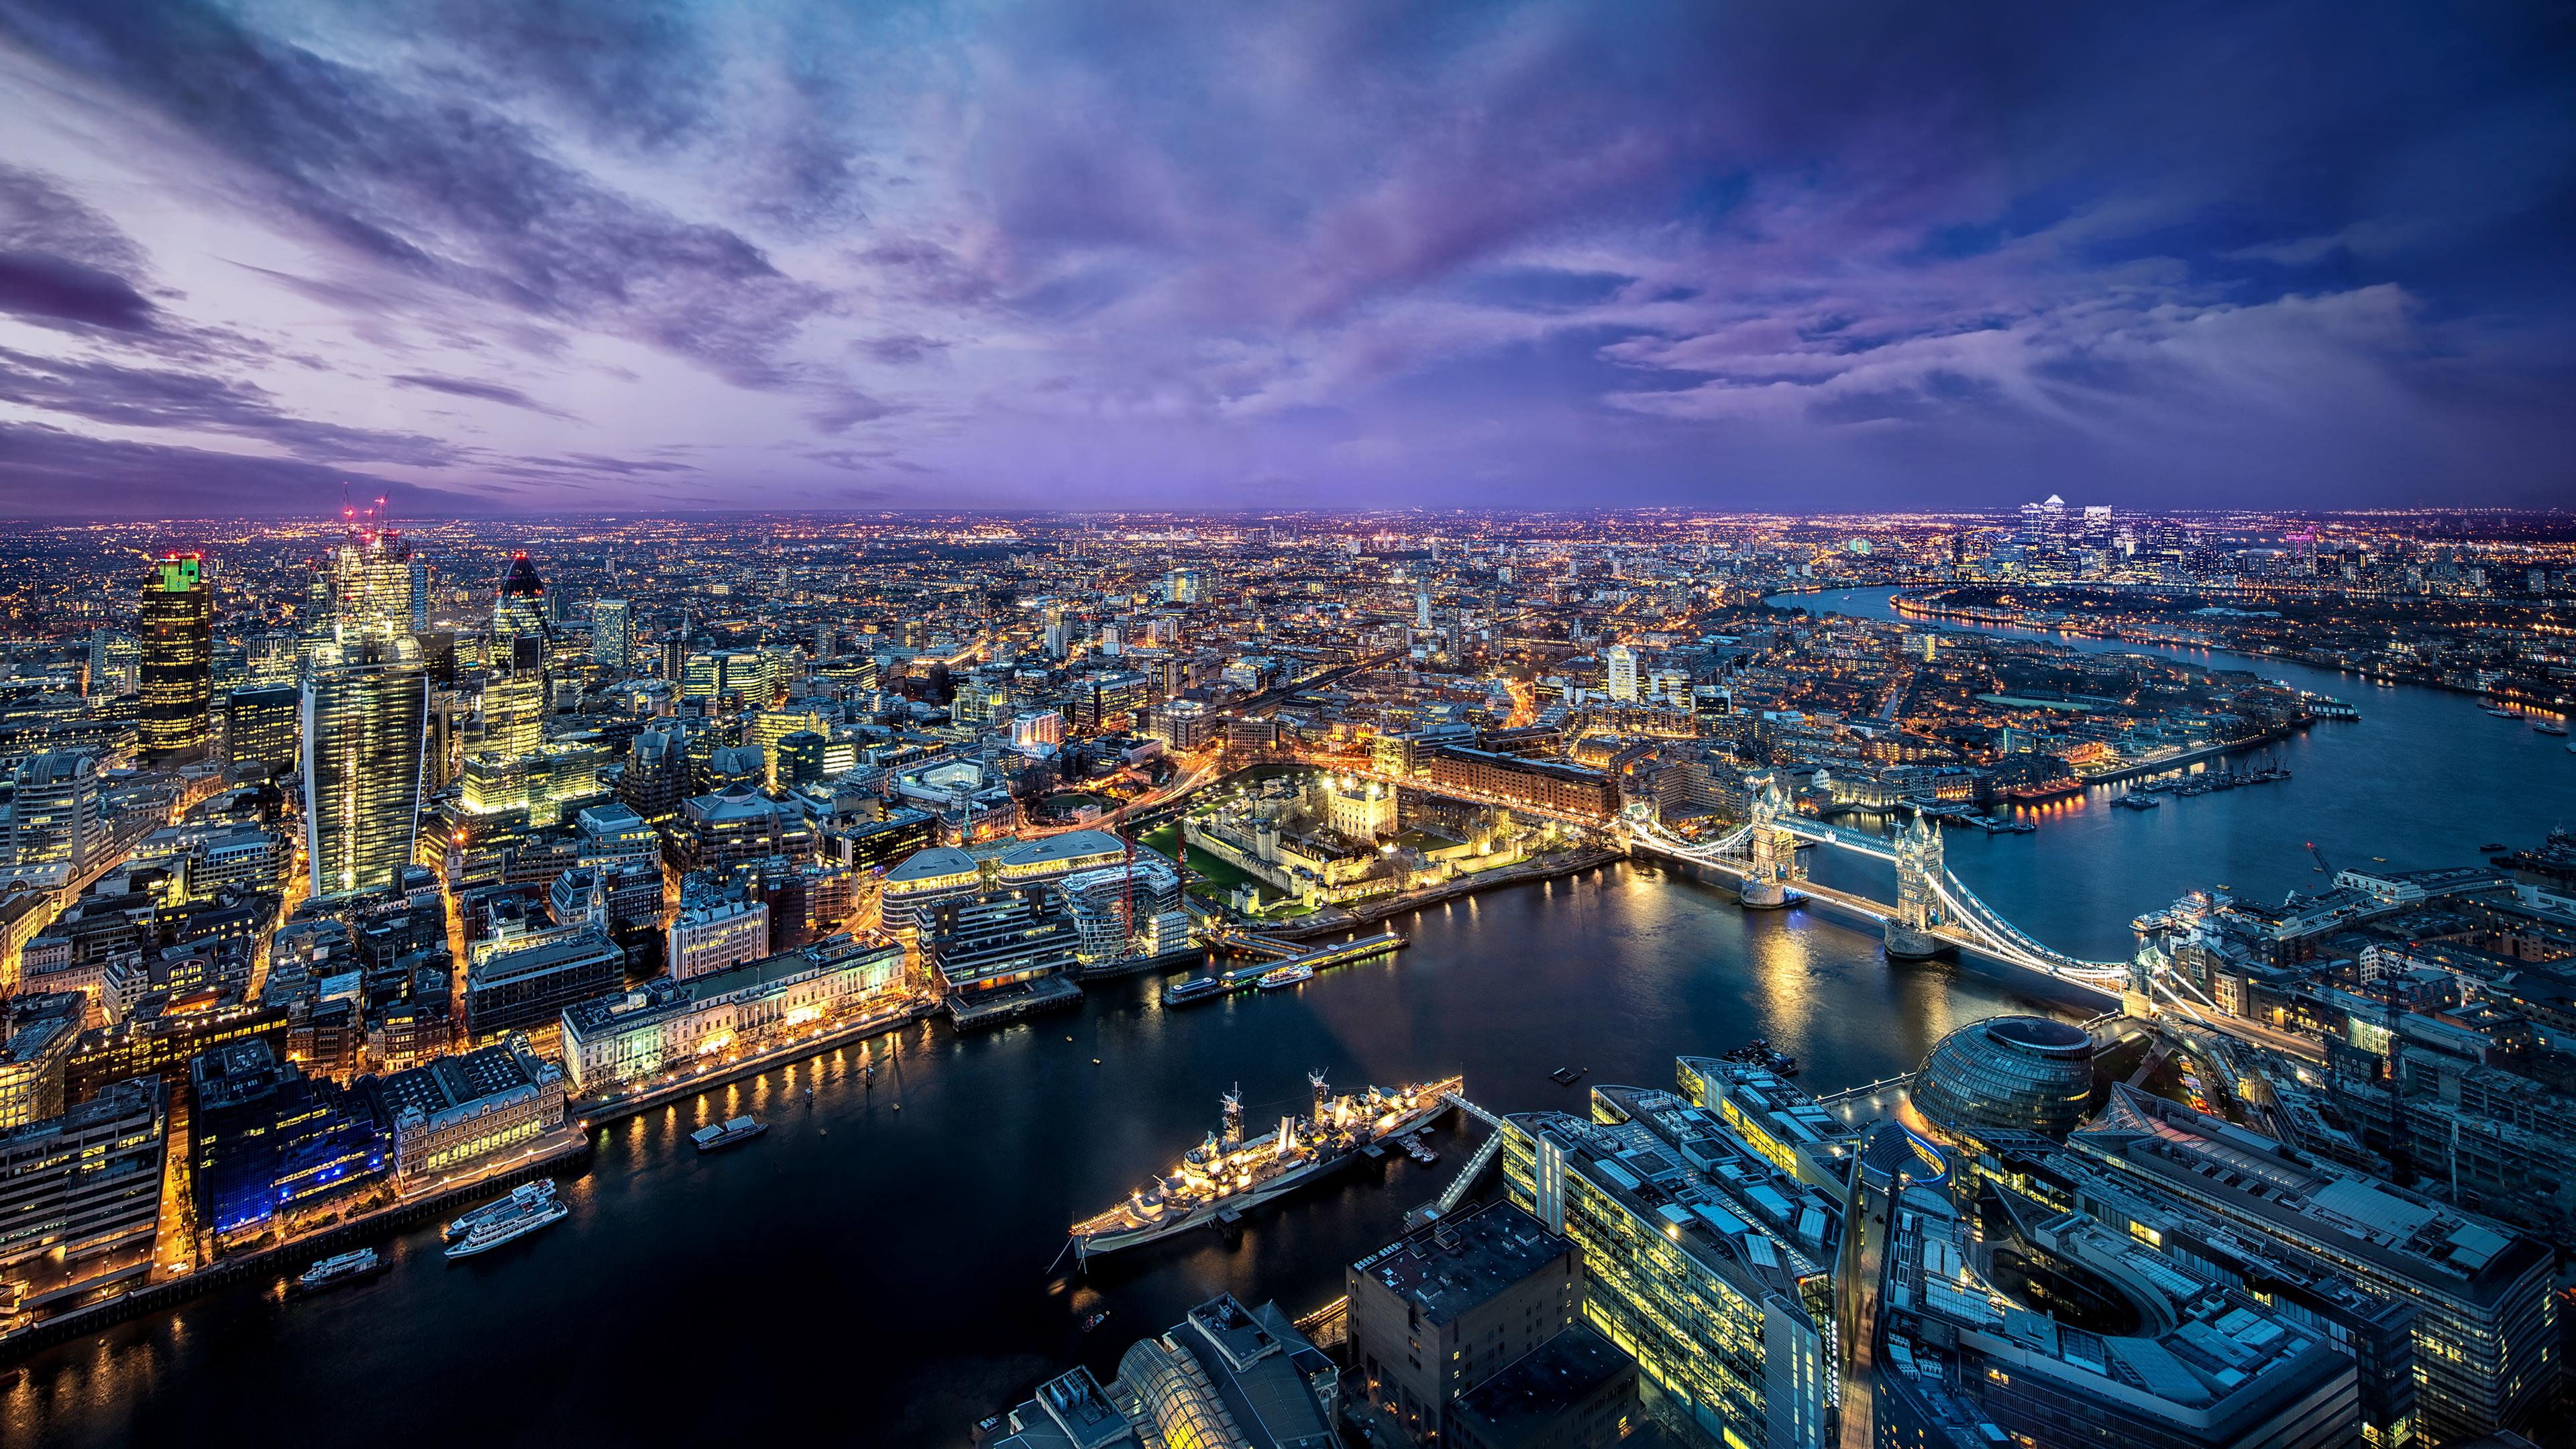 Downtown London Nightime Wallpaper 4k Desktop Backgrounds 3840x2160